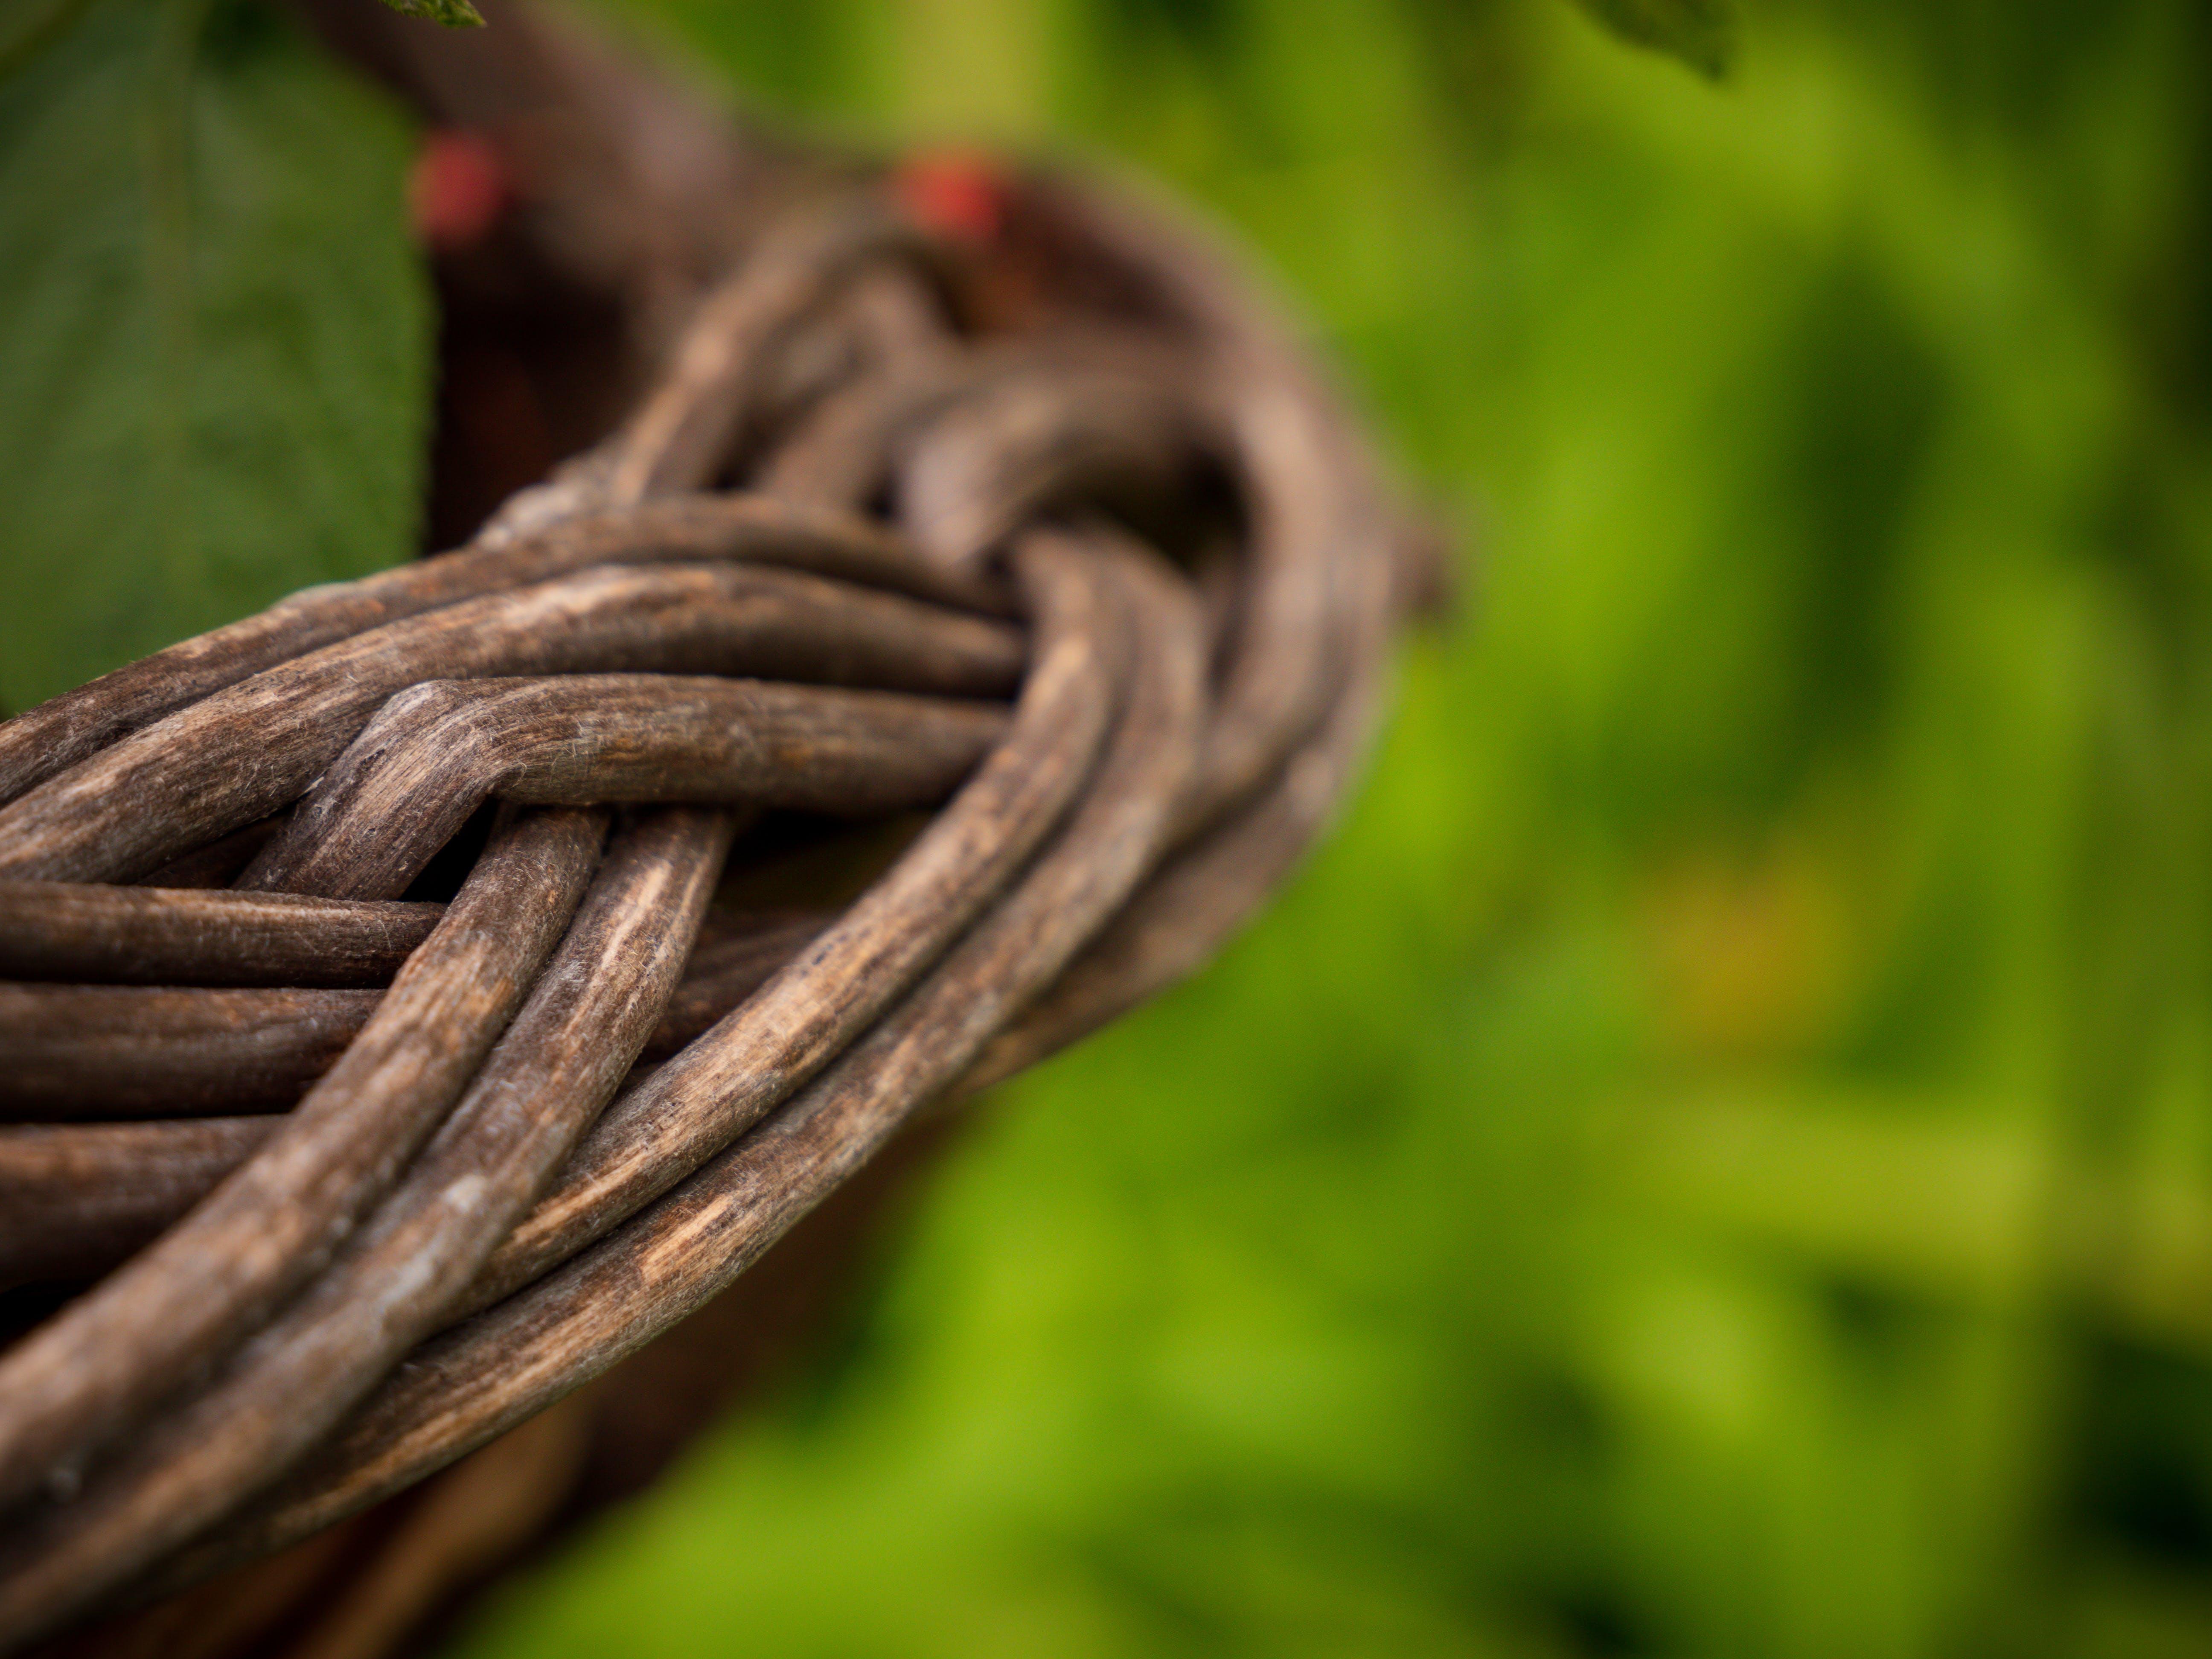 Free stock photo of detail, foliage, green, wallpaper